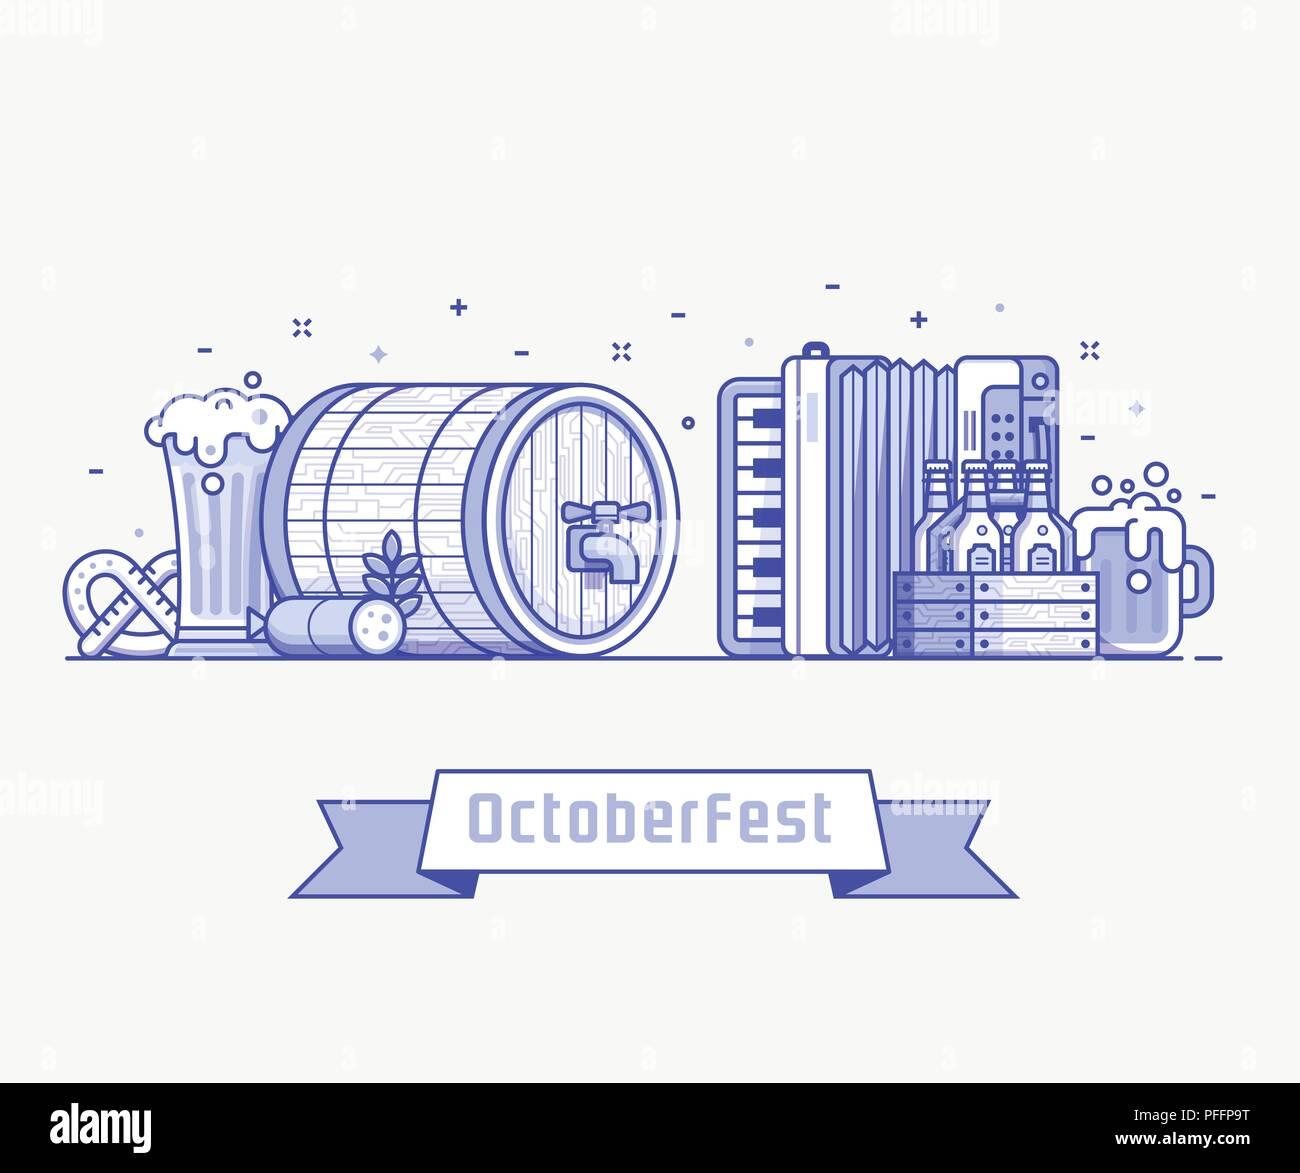 Oktoberfest Concept illustration - Stock Image